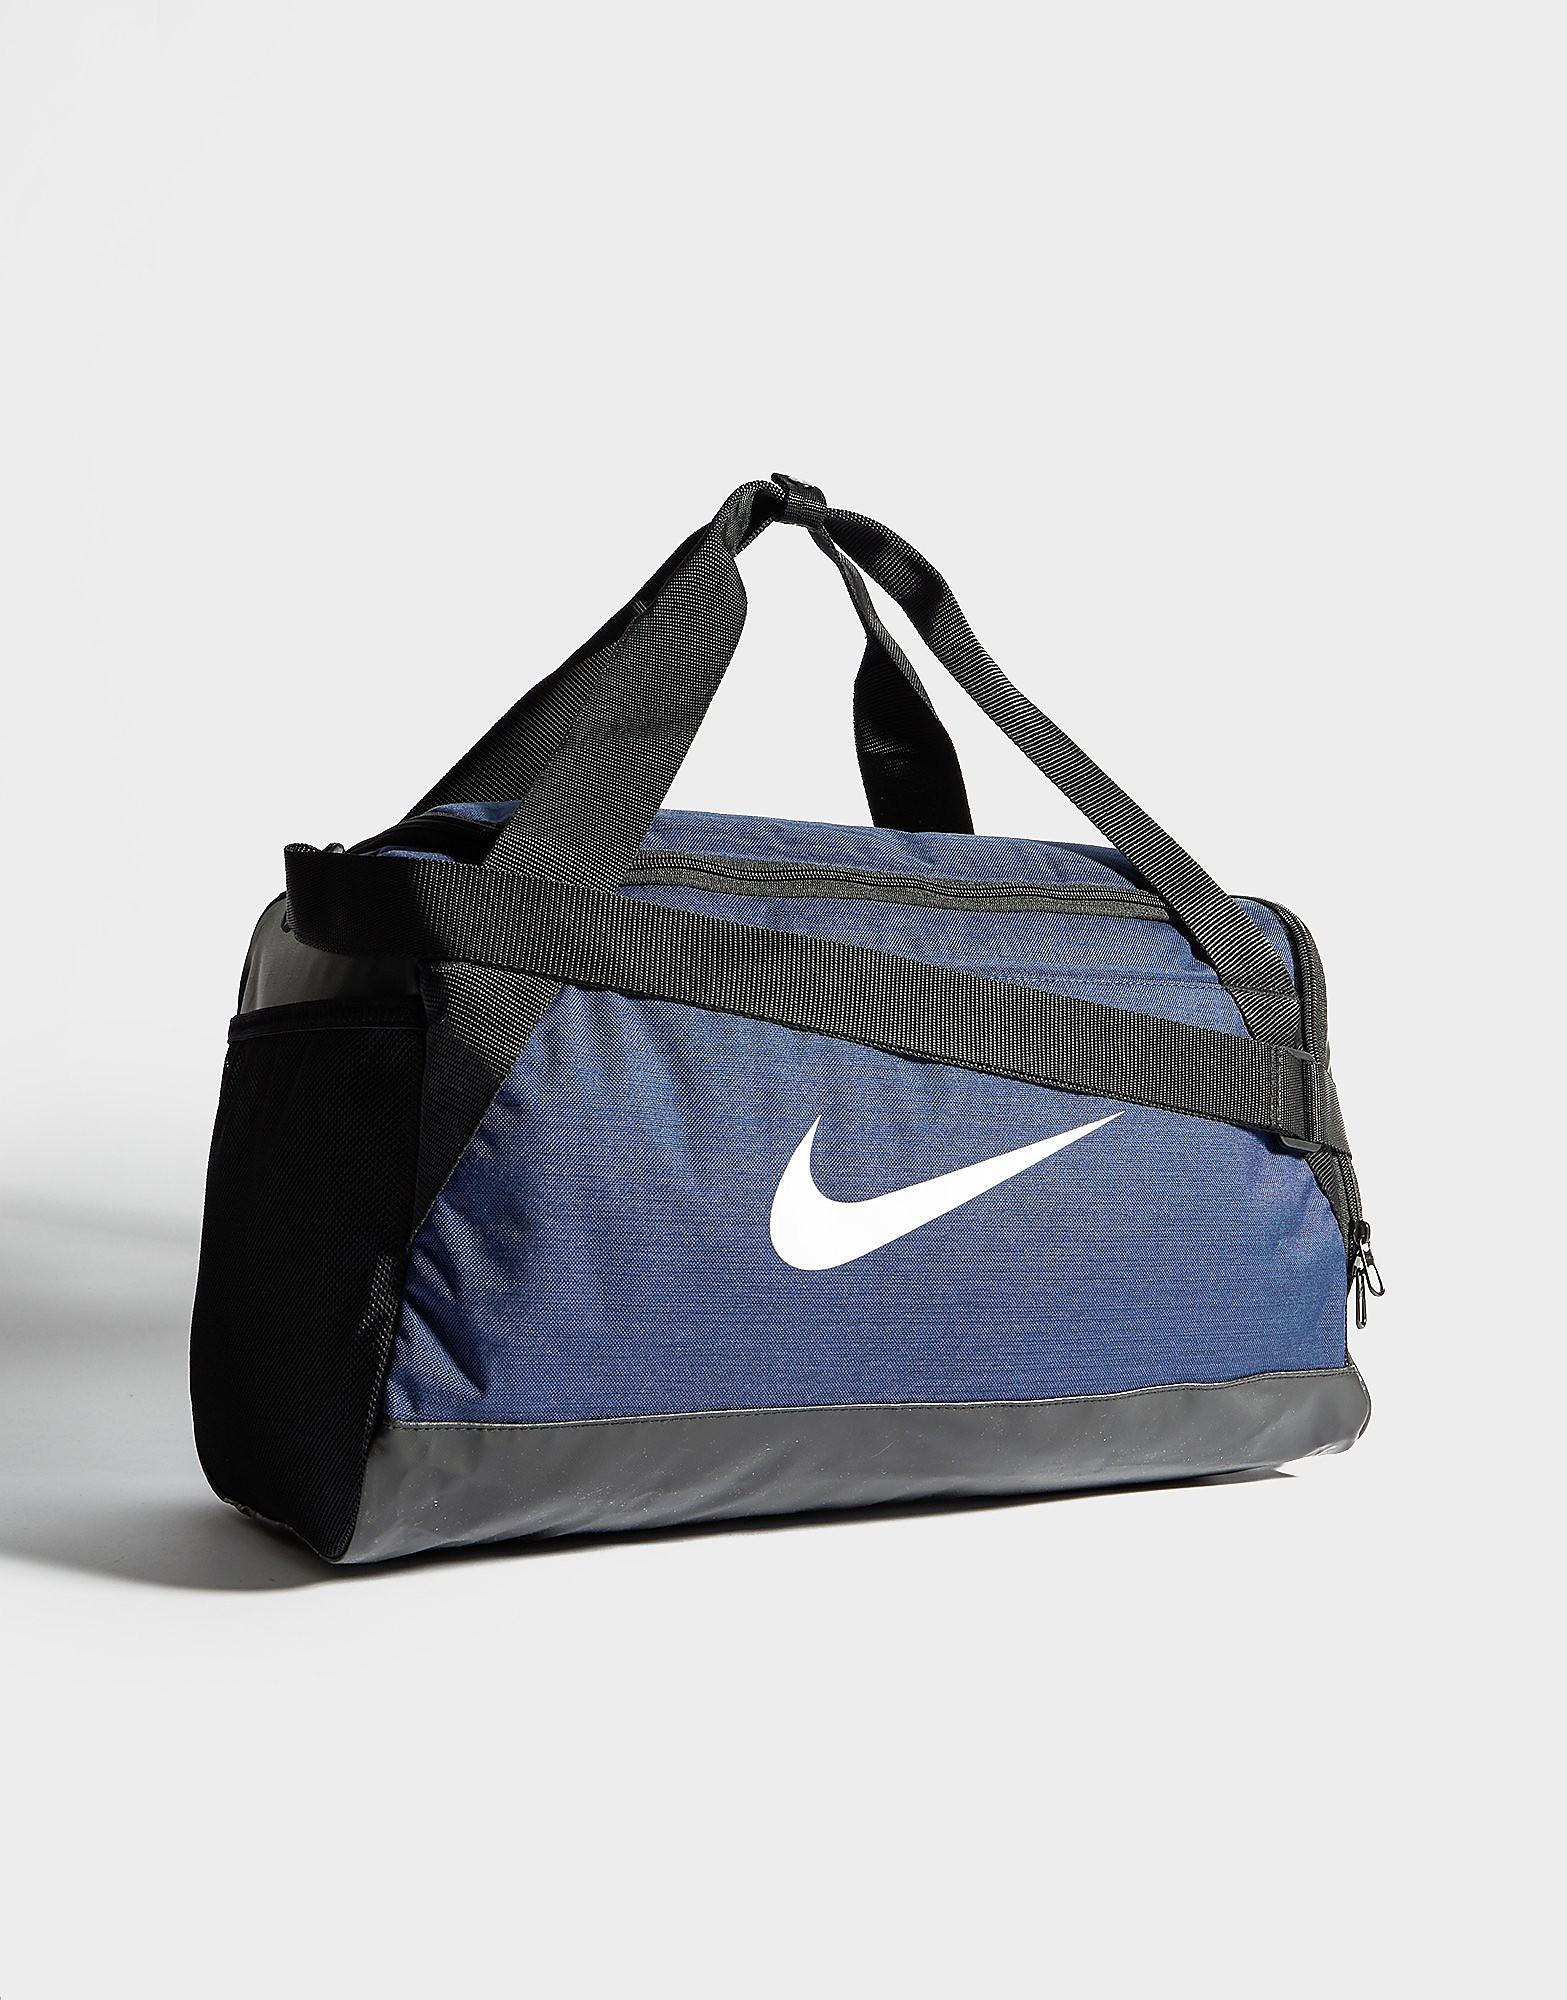 Nike Brasilia Small Sporttas - Obsidian/Black - Heren